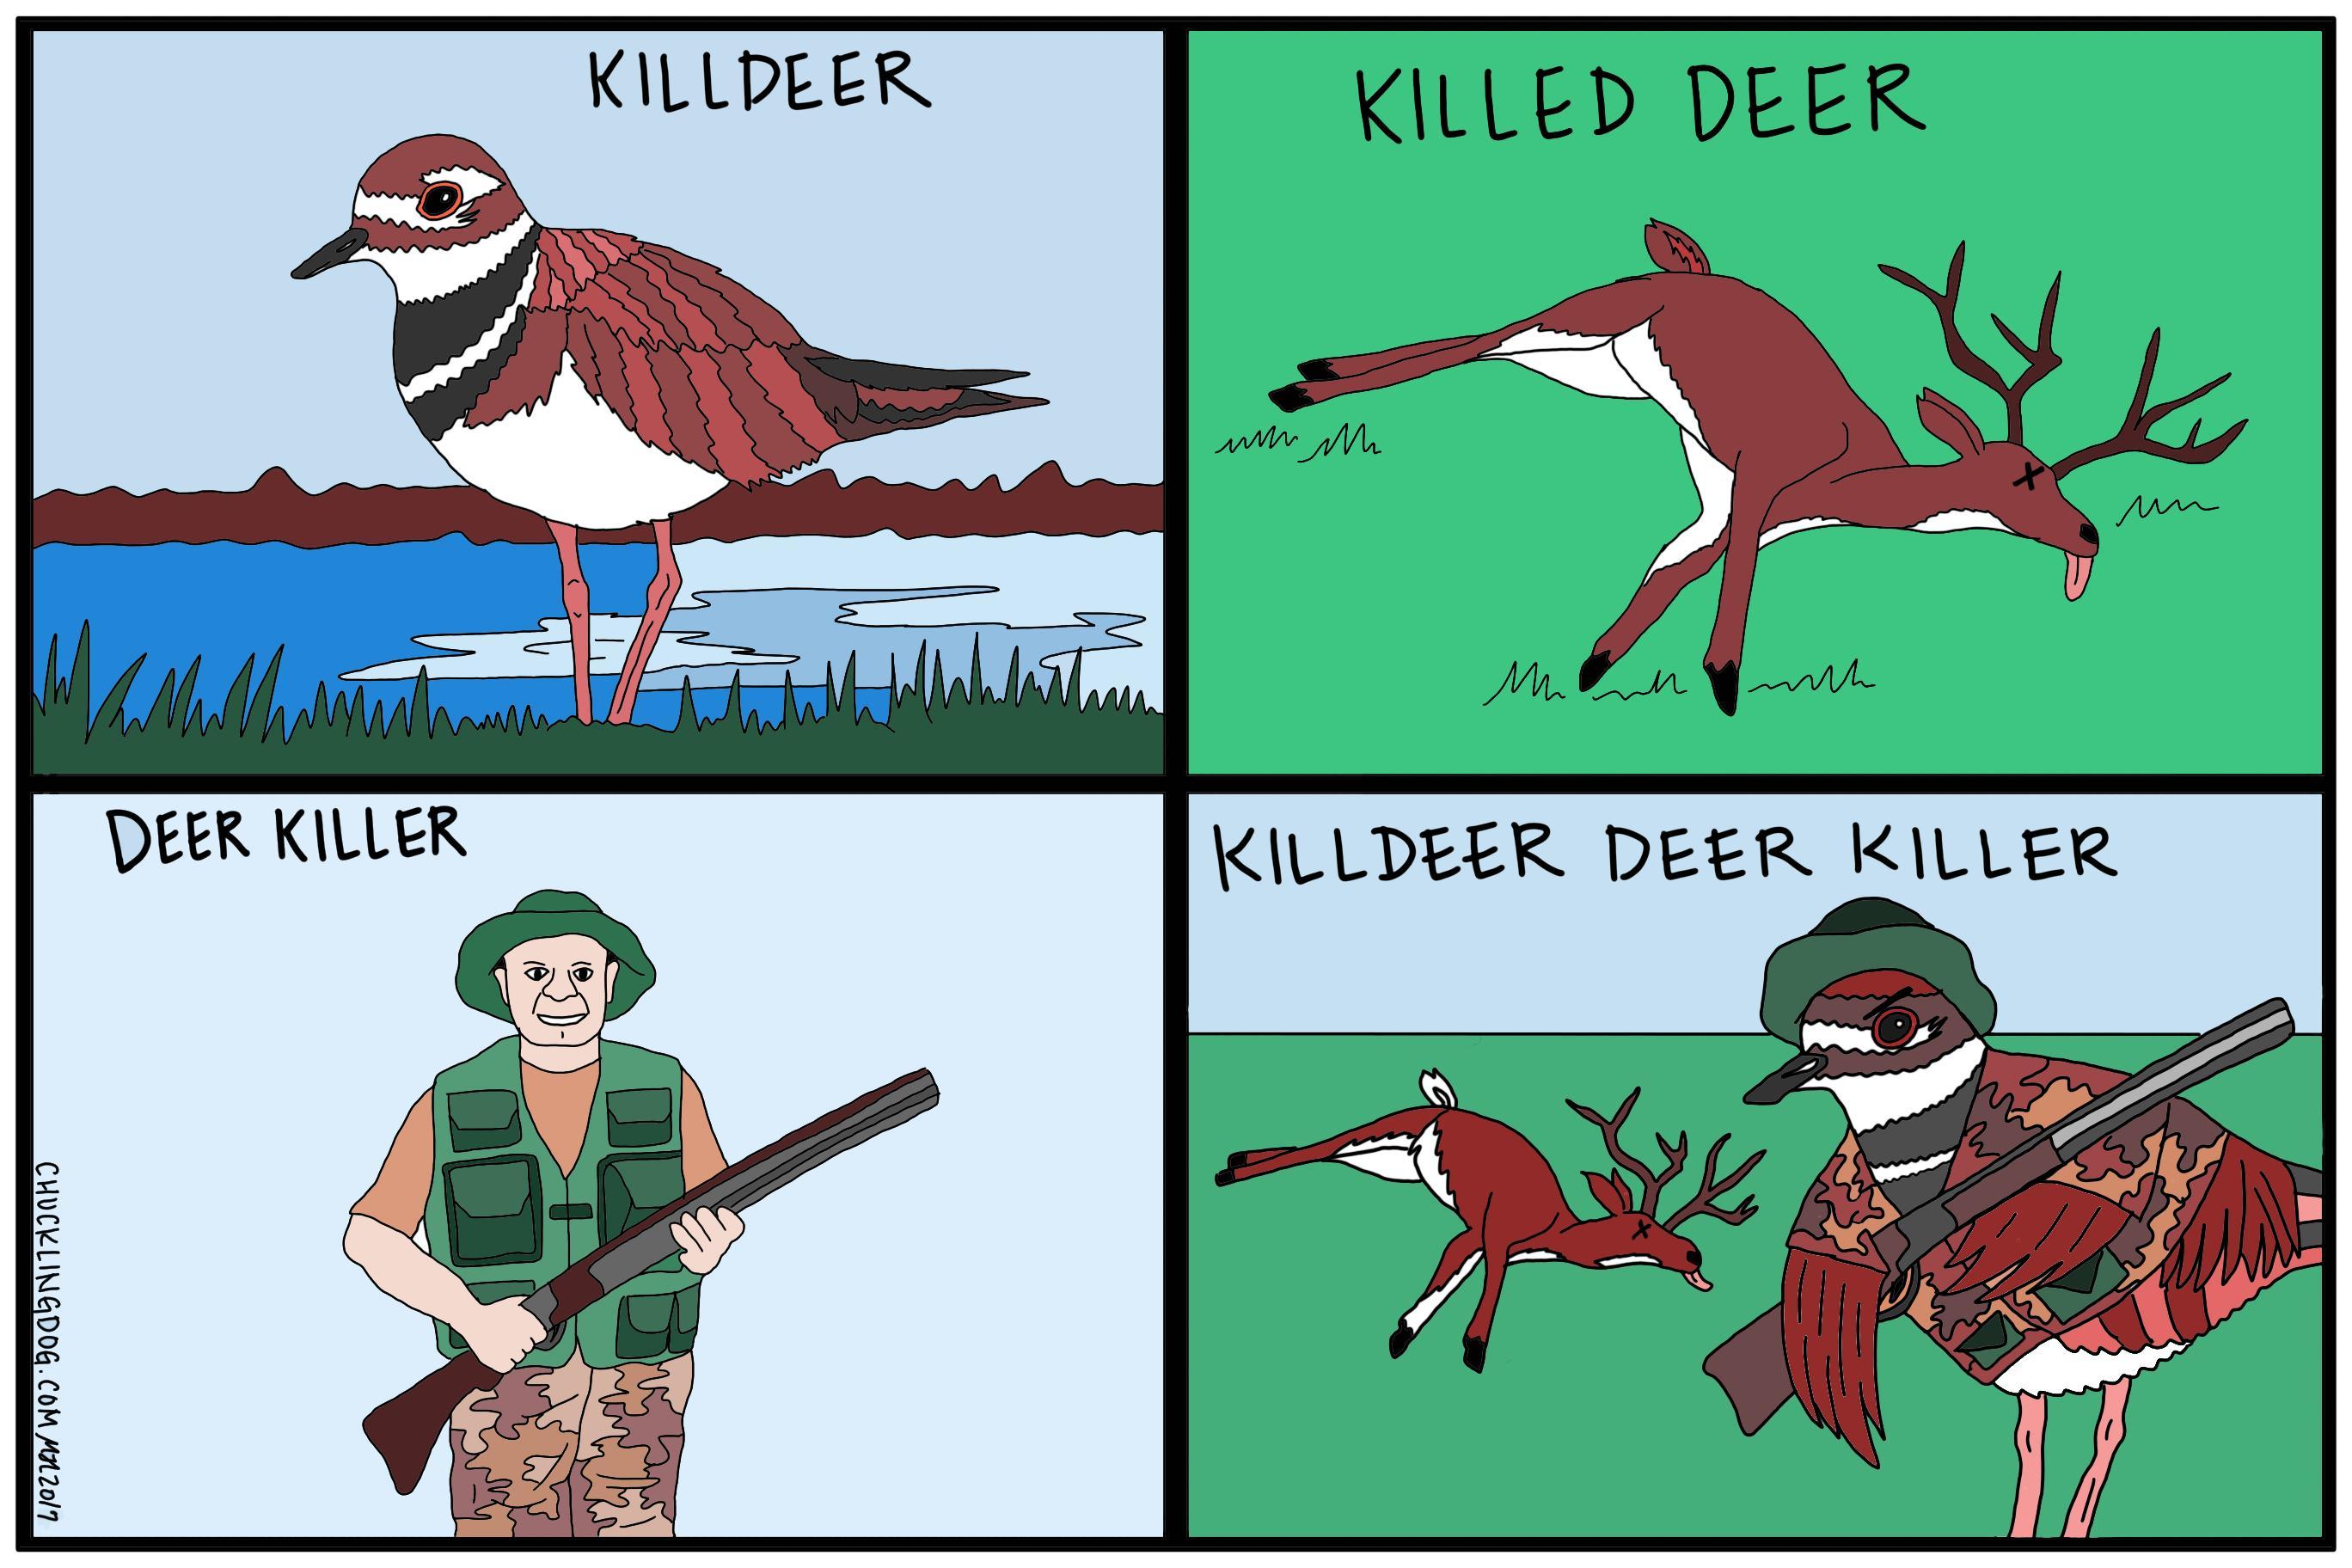 Killdeer.